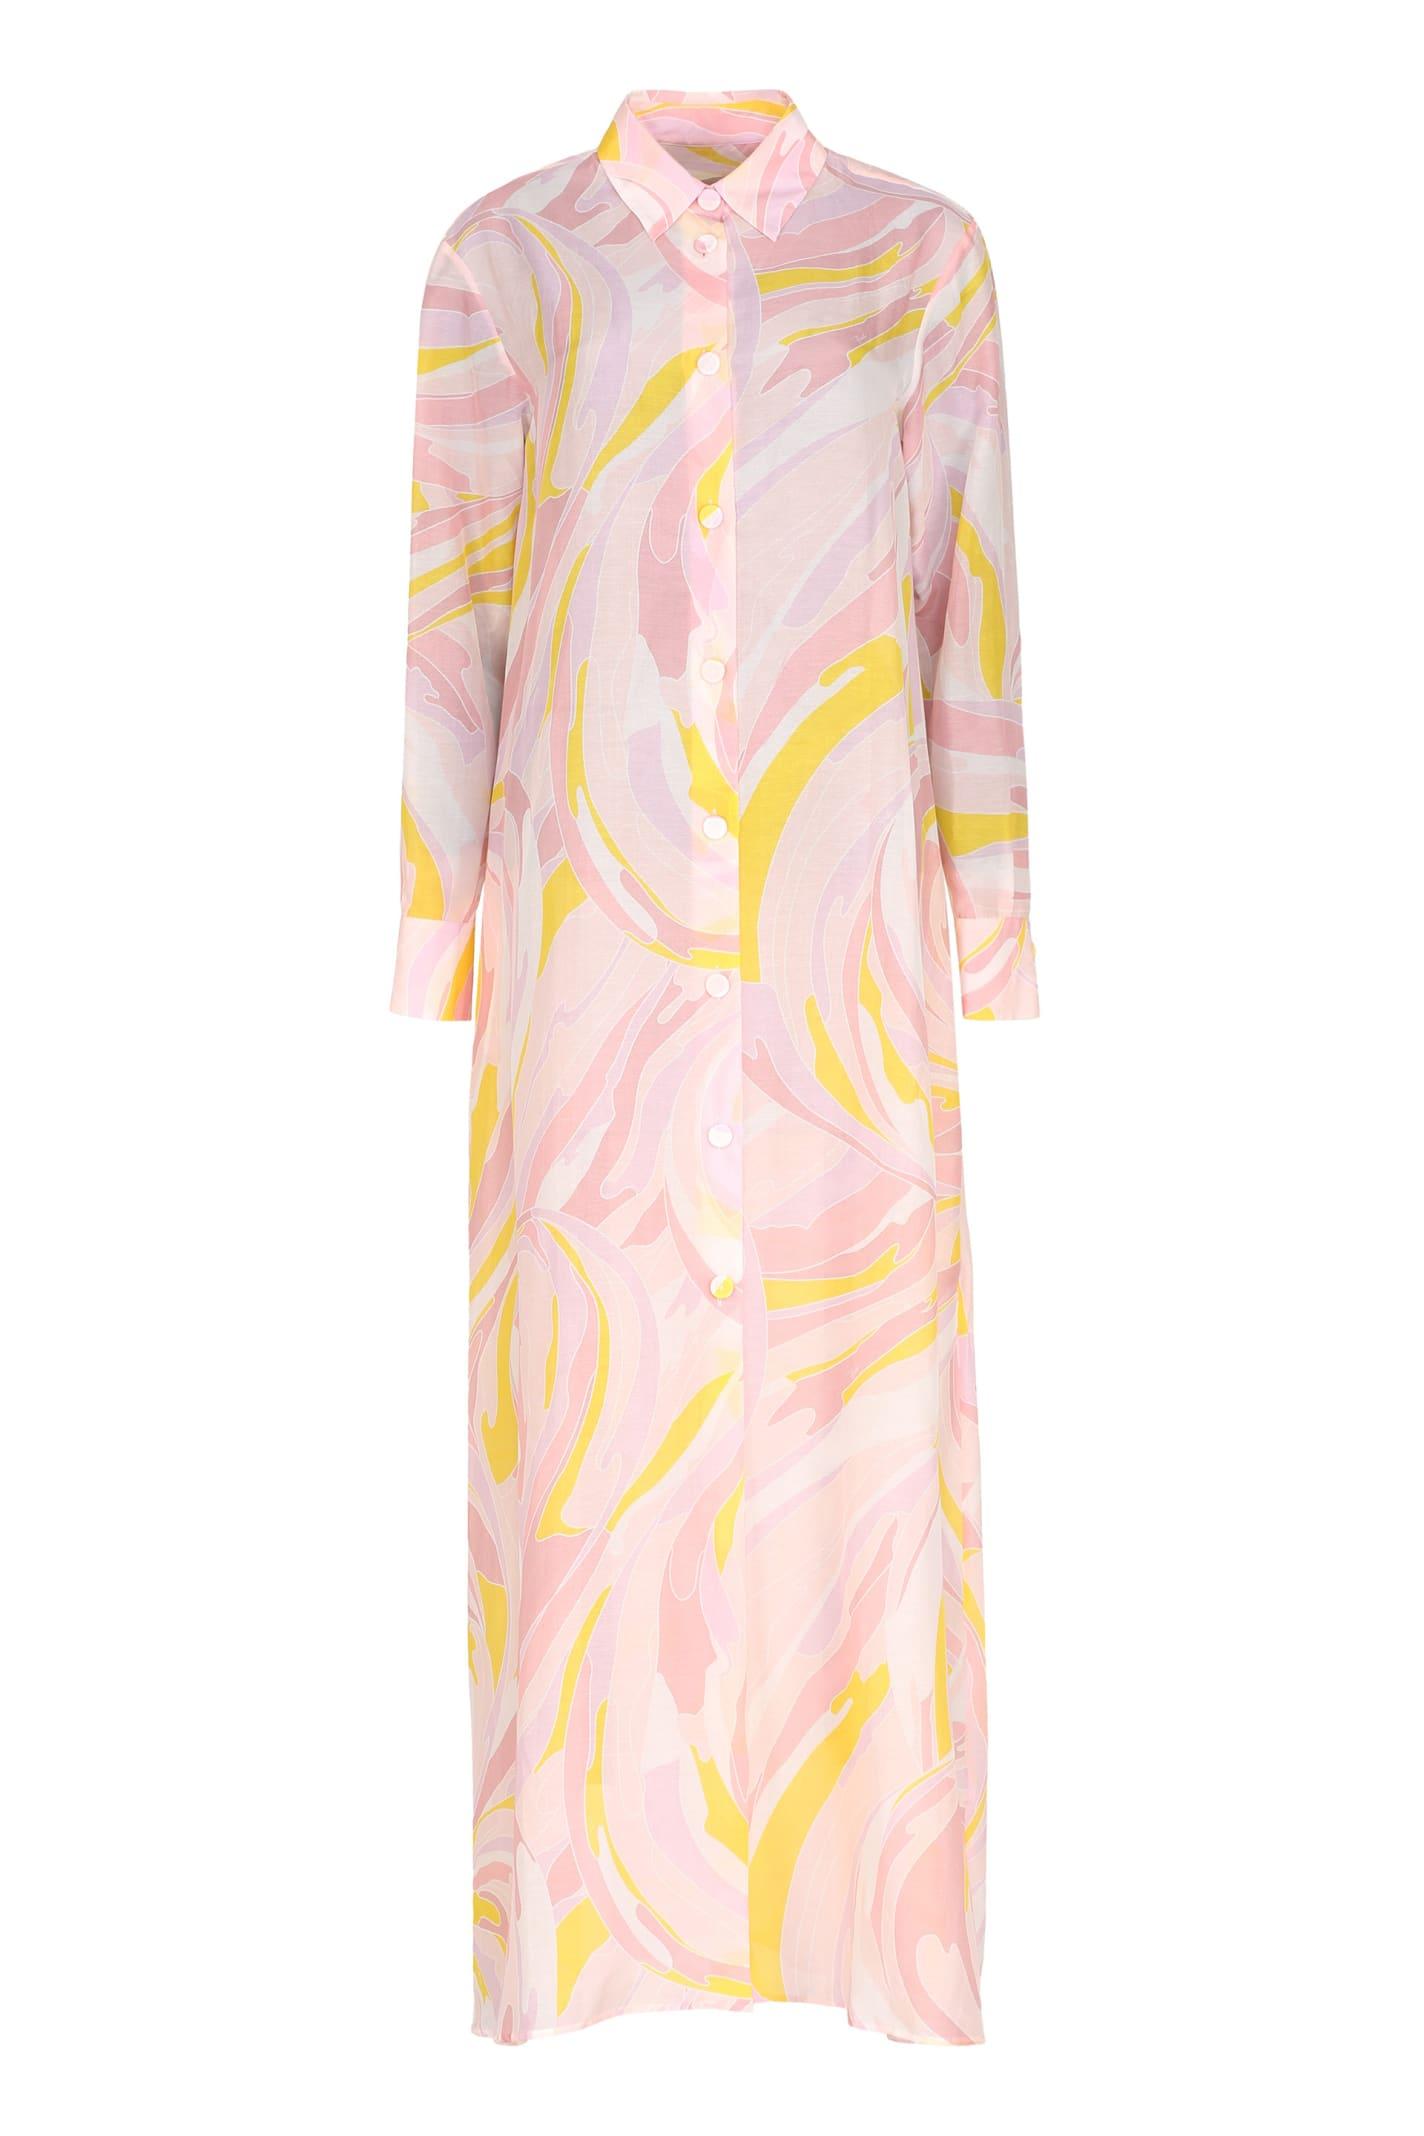 Emilio Pucci Cotton-silk Blend Dress